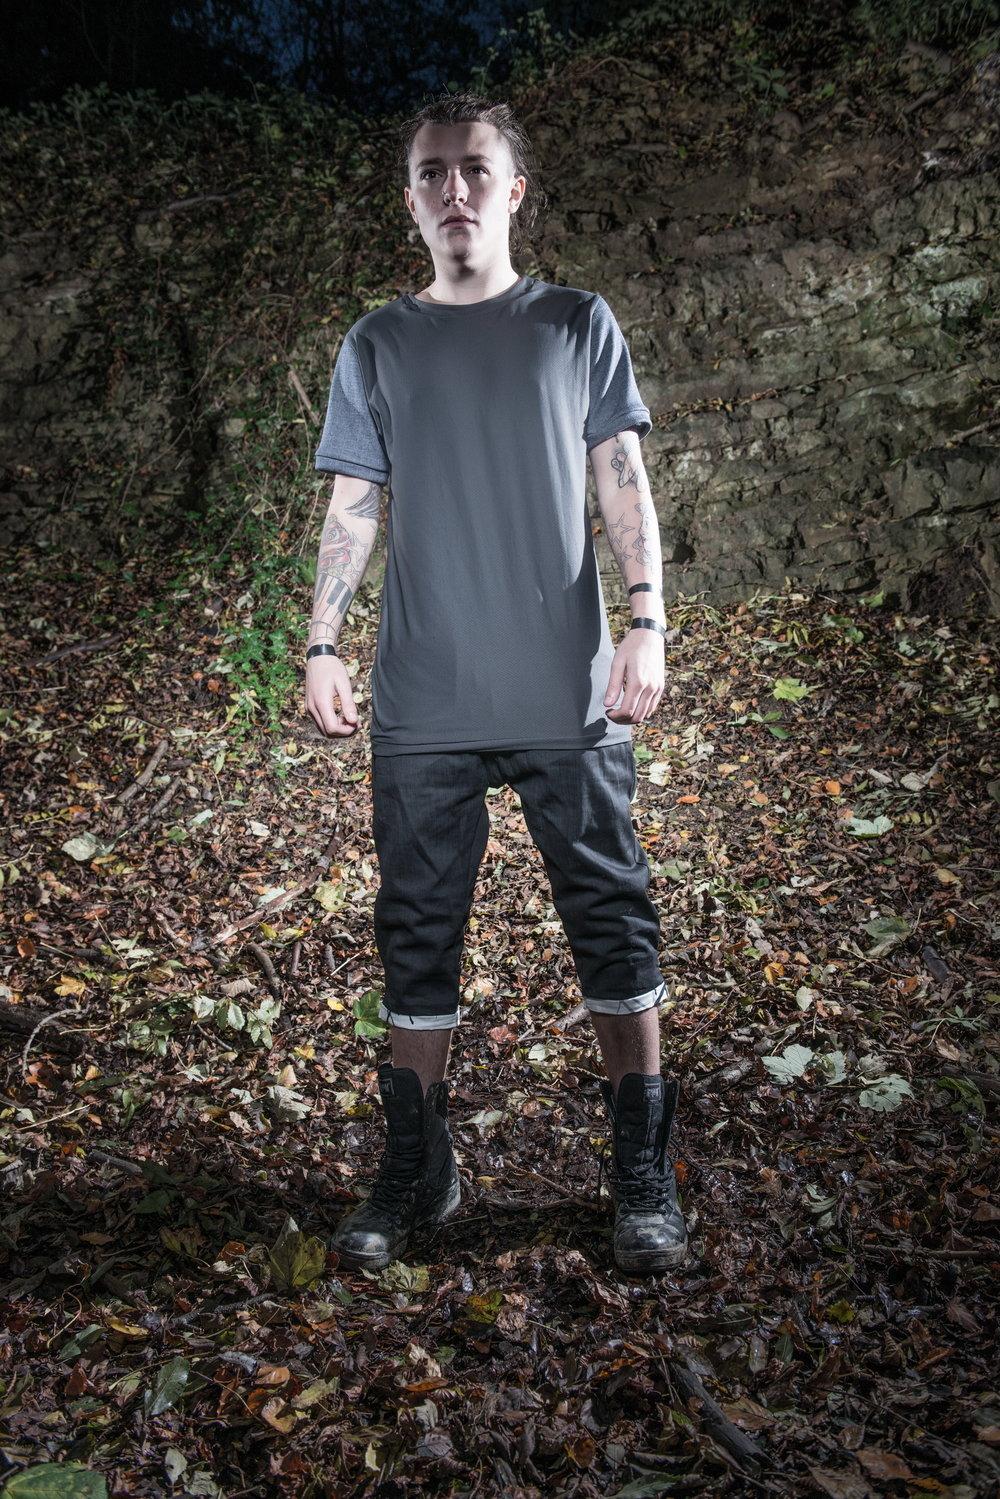 zaramia-ava-zaramiaava-leeds-fashion-designer-ethical-sustainable-tailored-minimalist-versatile-drape-grey-shirt-vest-top-denim-trousers-black-grey-texture-styling-menswear-model-photoshoot-10